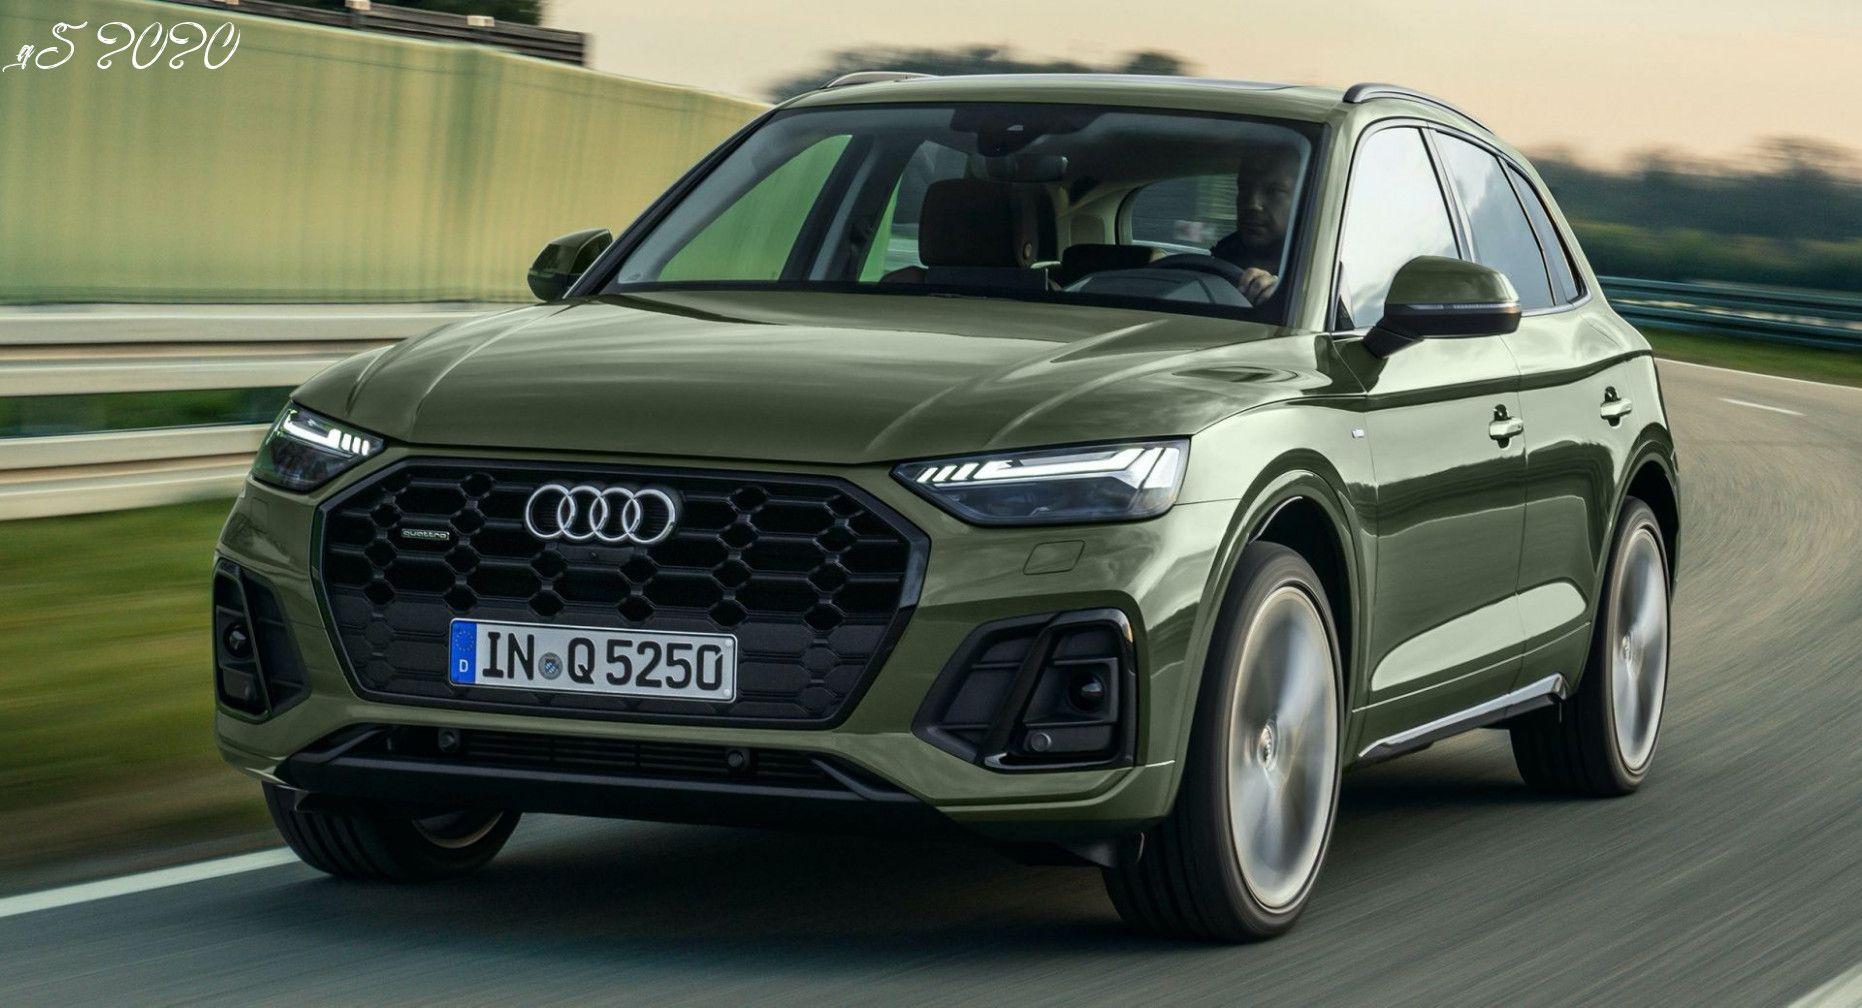 Q5 2020 In 2020 Bmw X3 Audi Q5 Audi